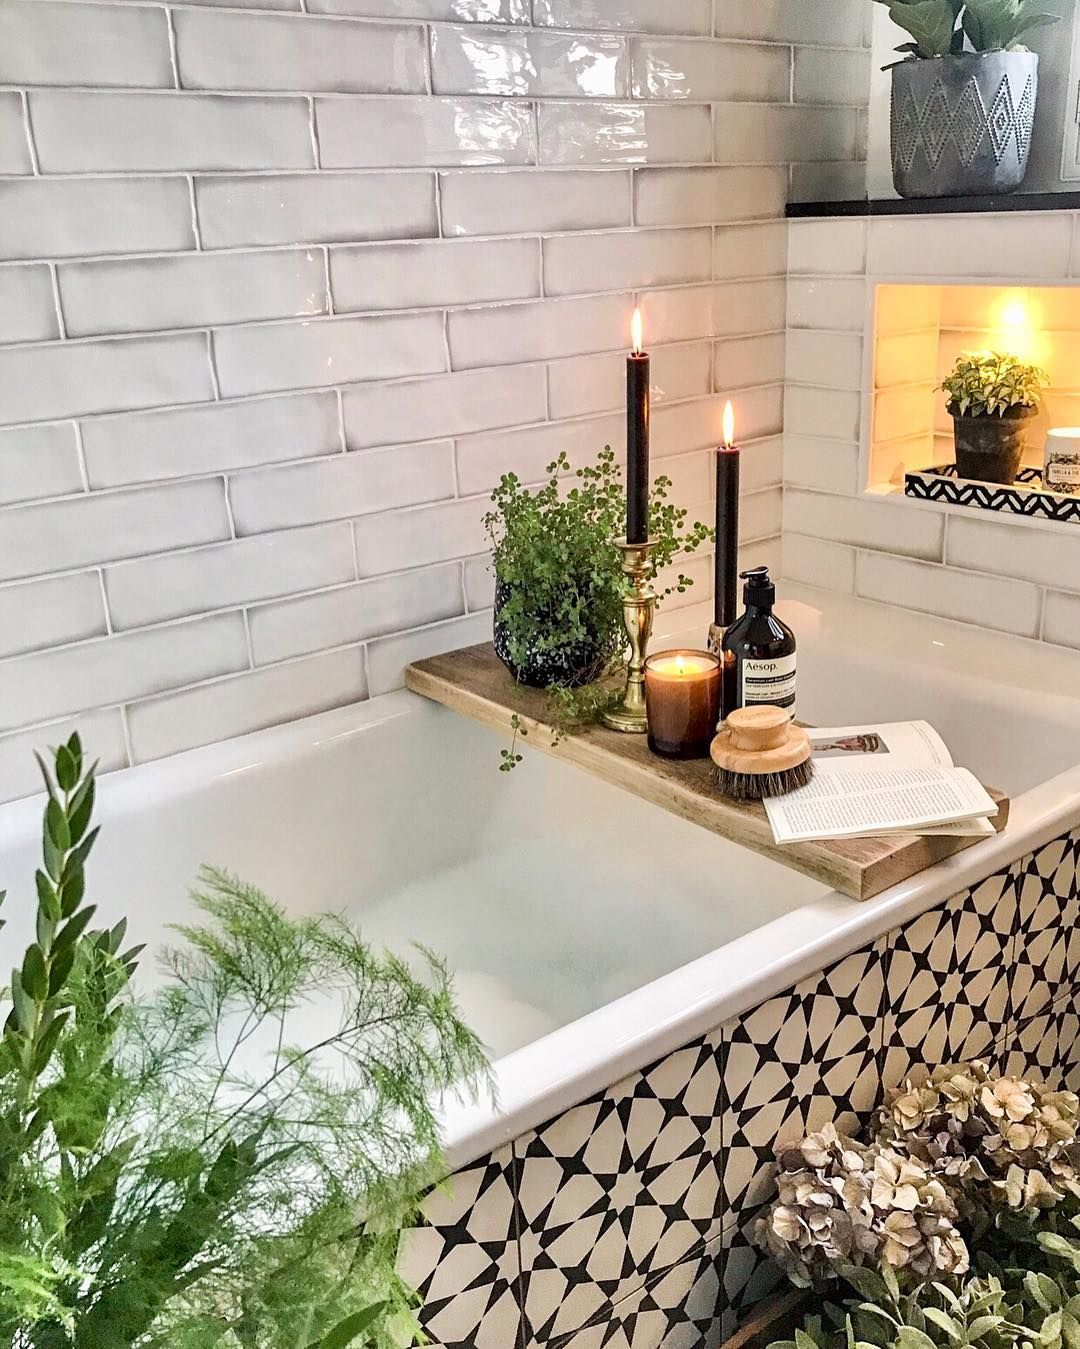 designatnineteen's bathroom wall tiles from topps